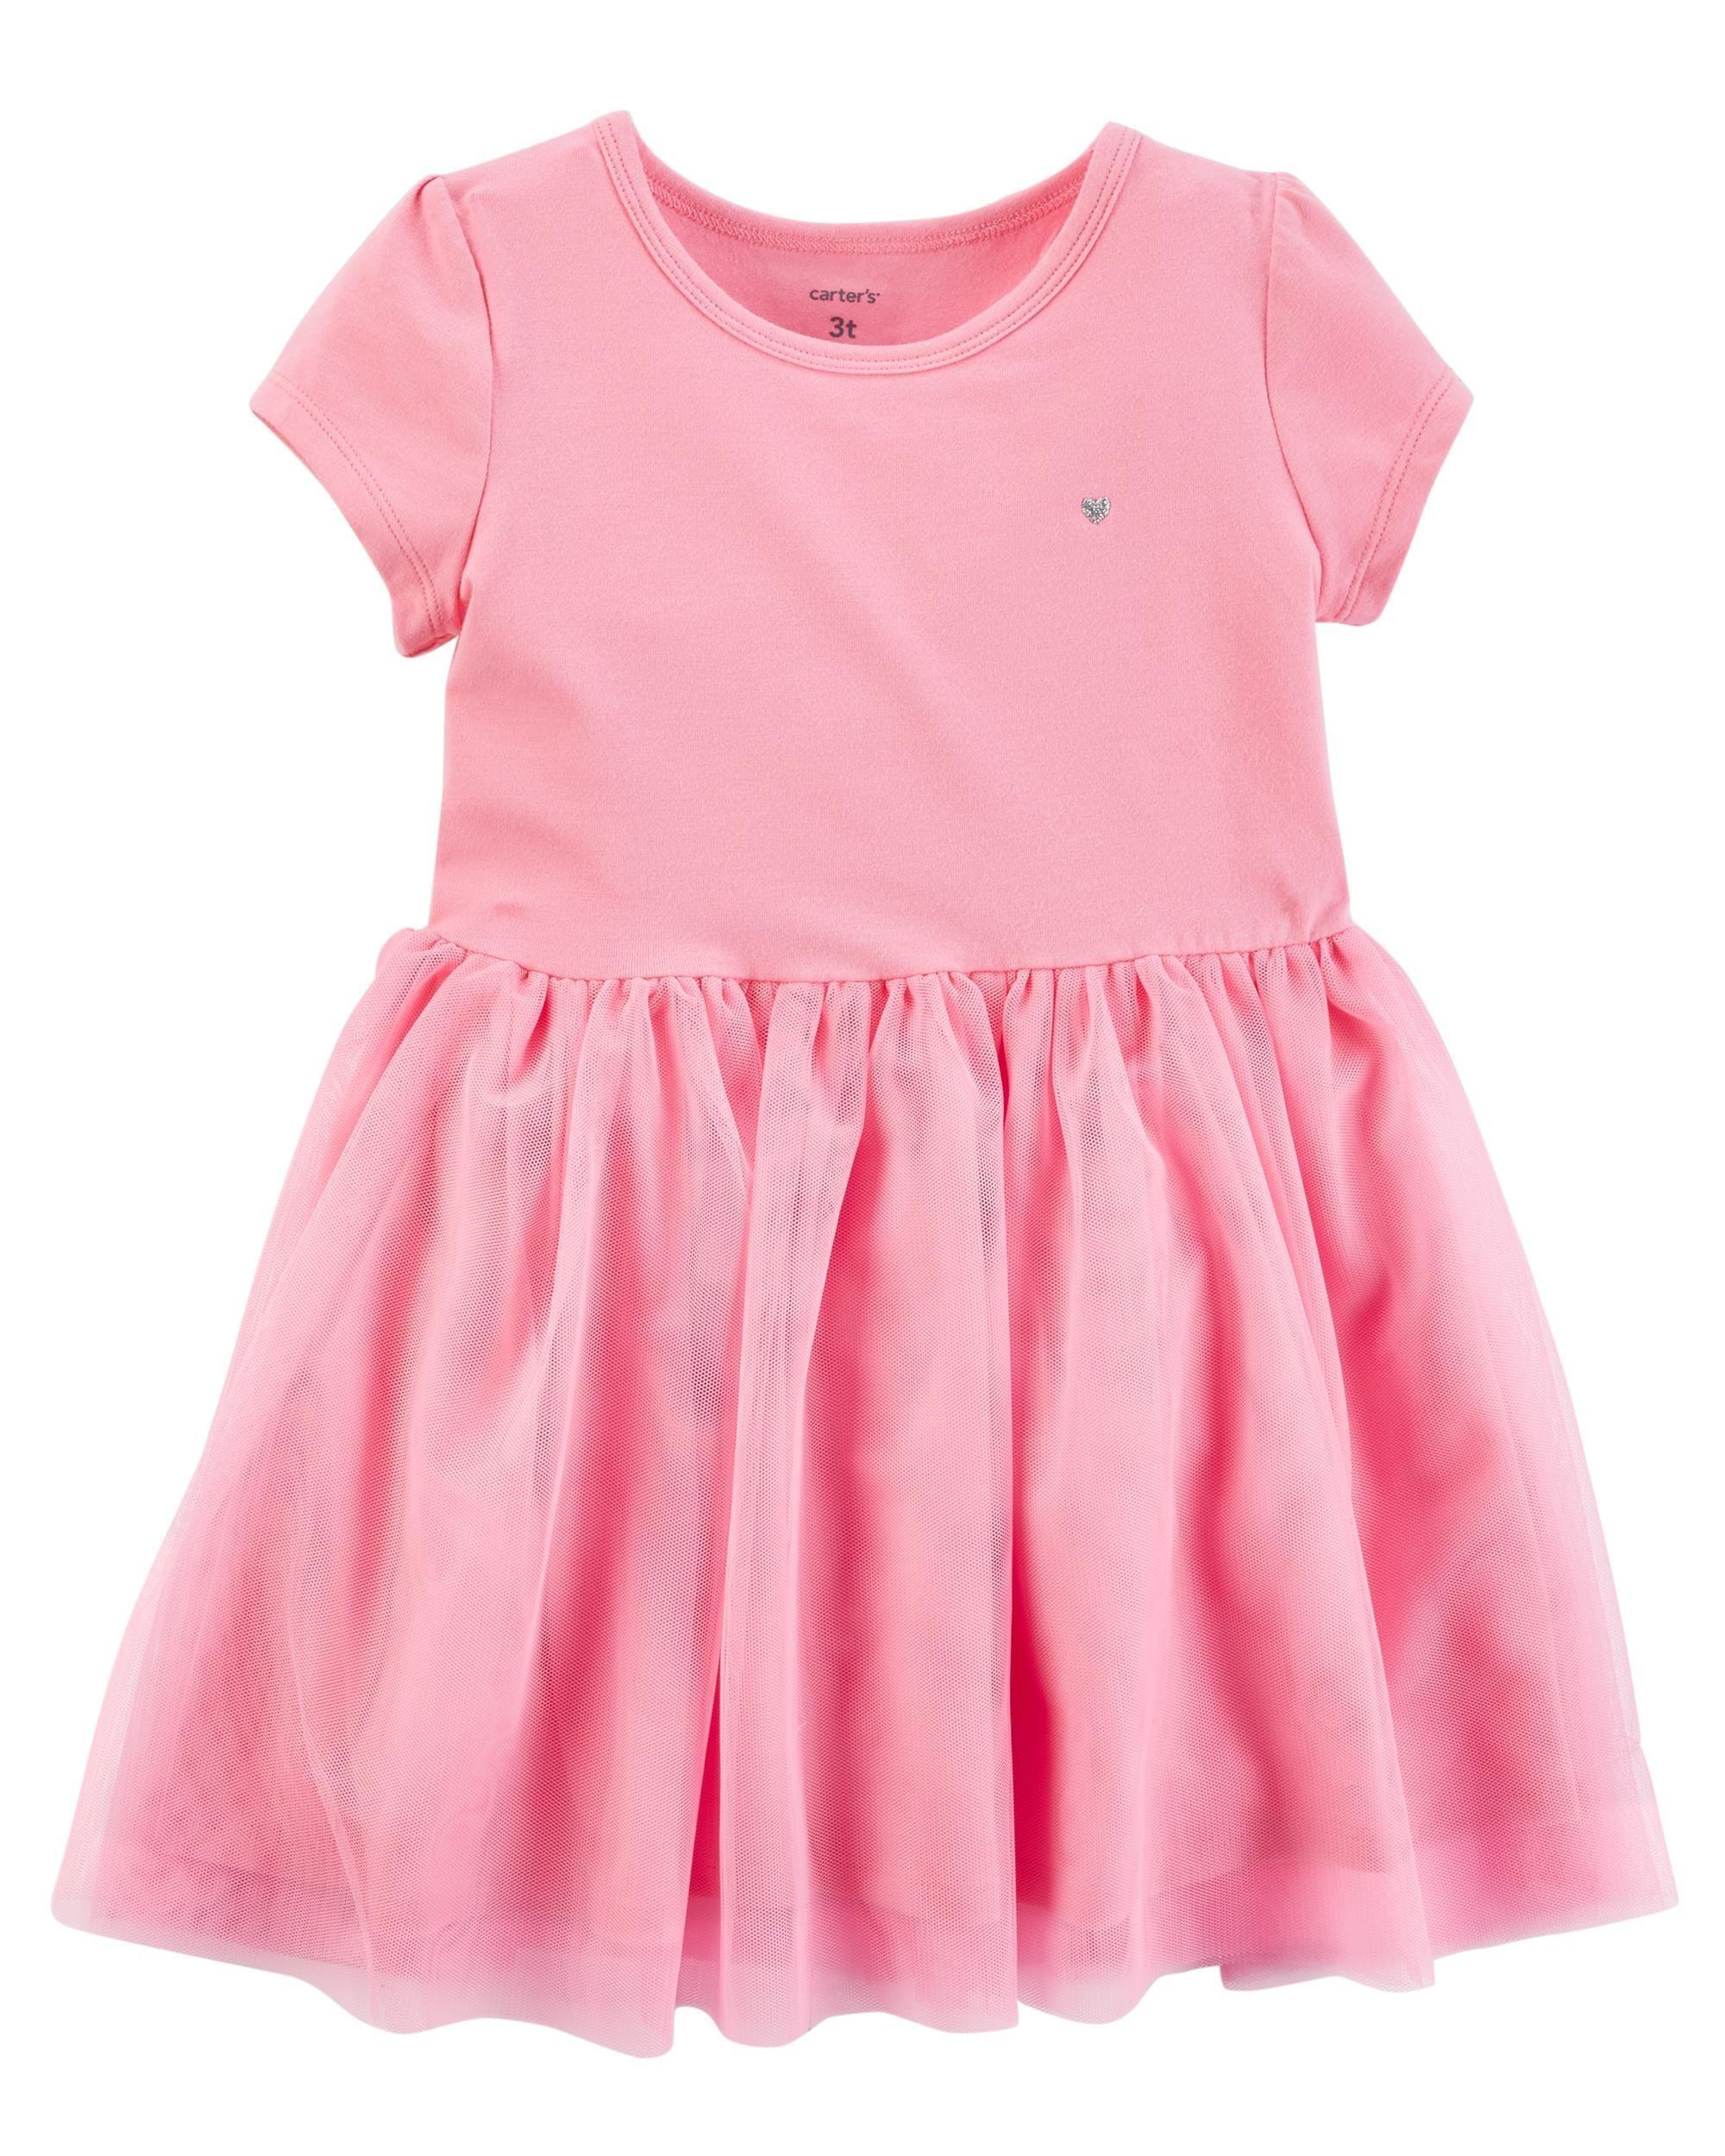 7538a08595d3 Tutu Jersey Dress | Toddler | Toddler dress clothes, Baby dress ...